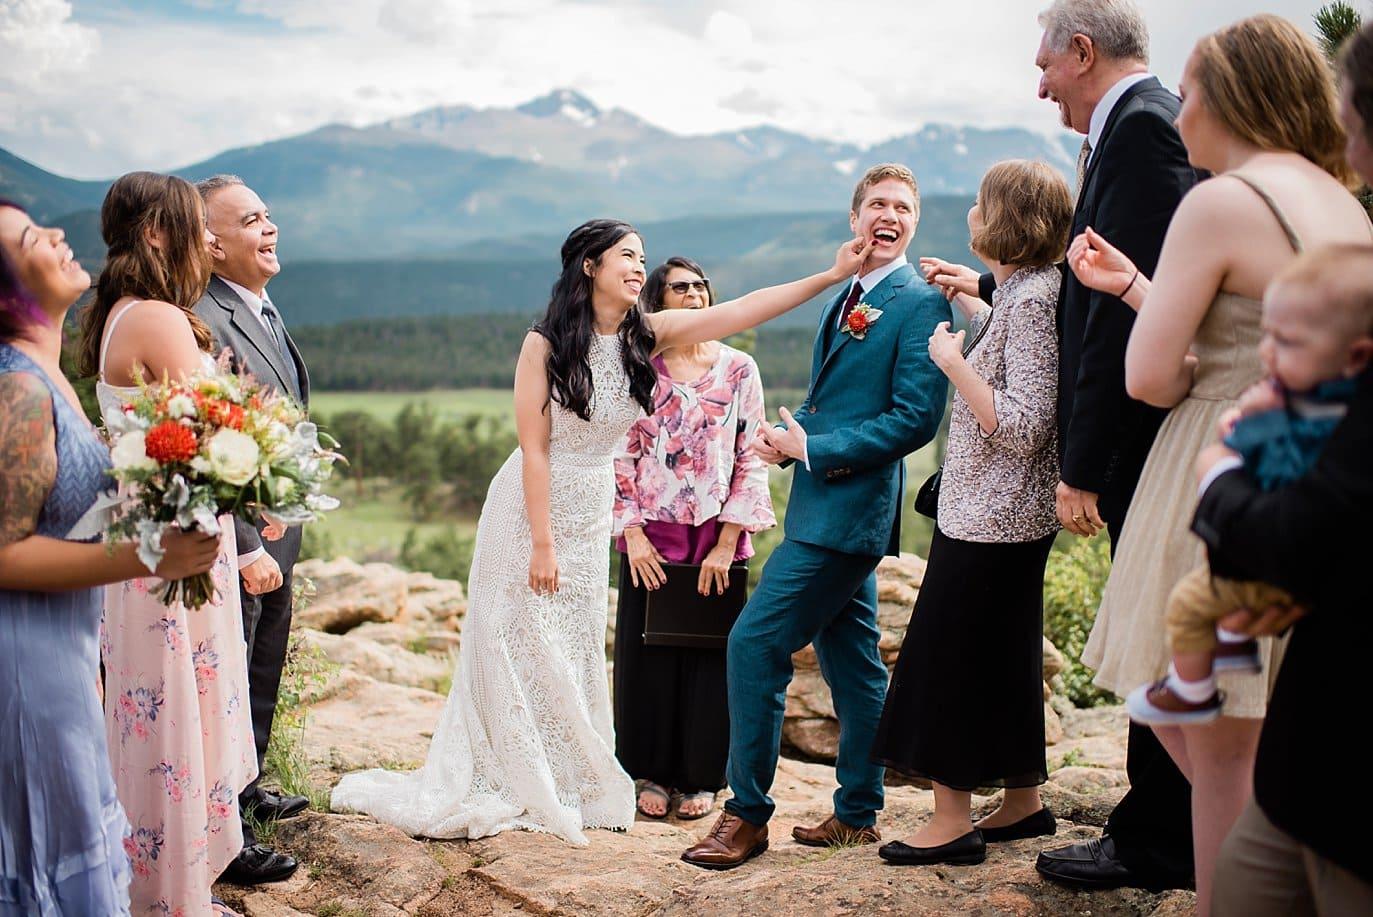 Romantic RMNP 3M Curve Wedding at Rocky Mountain National Park Wedding by RMNP Wedding Photographer Jennie Crate